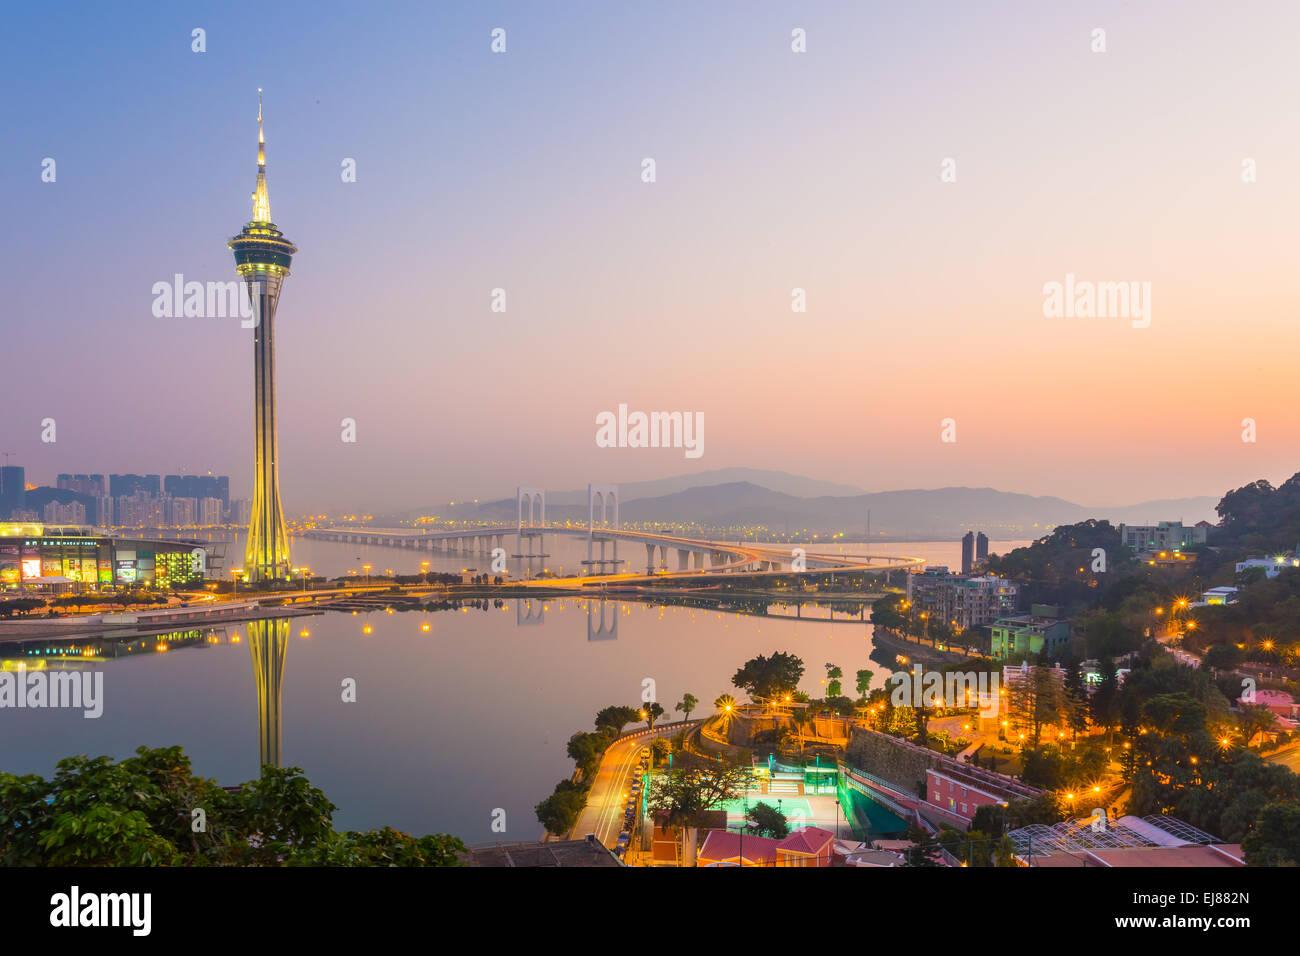 La Tour de Macau, Chine Photo Stock